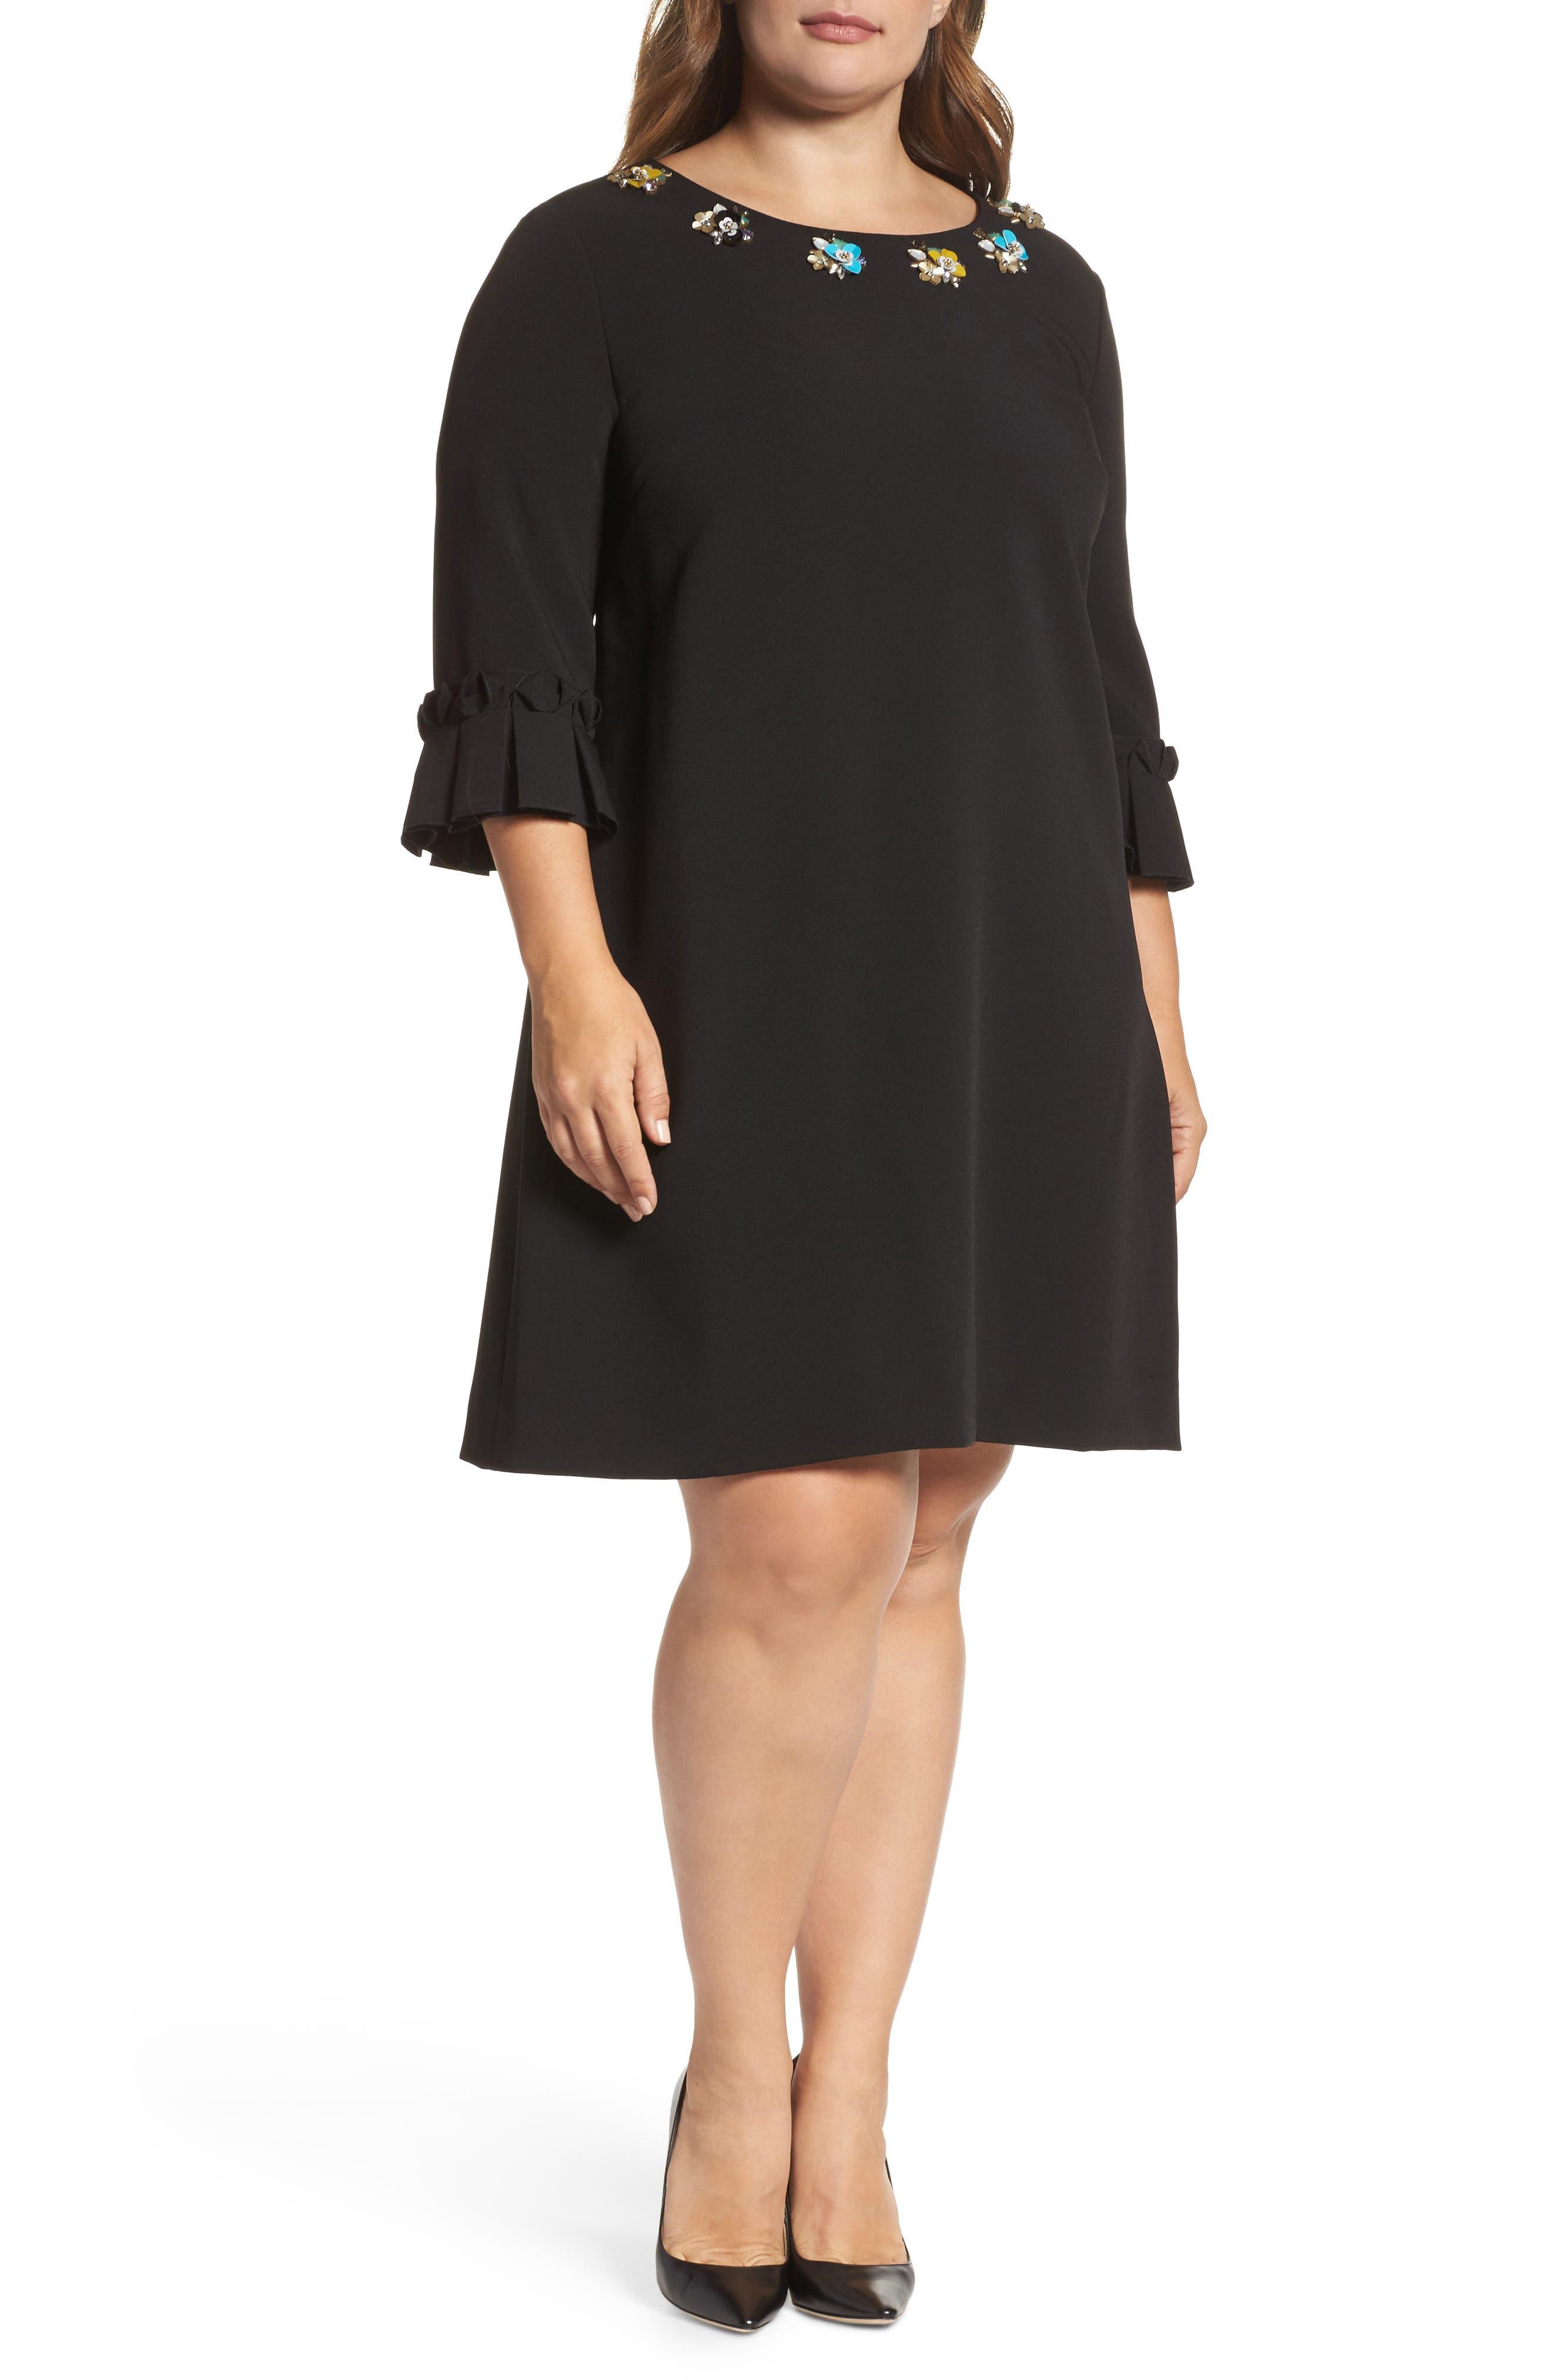 Main Image - Tahari Embellished Bell Sleeve Shift Dress (Plus Size)